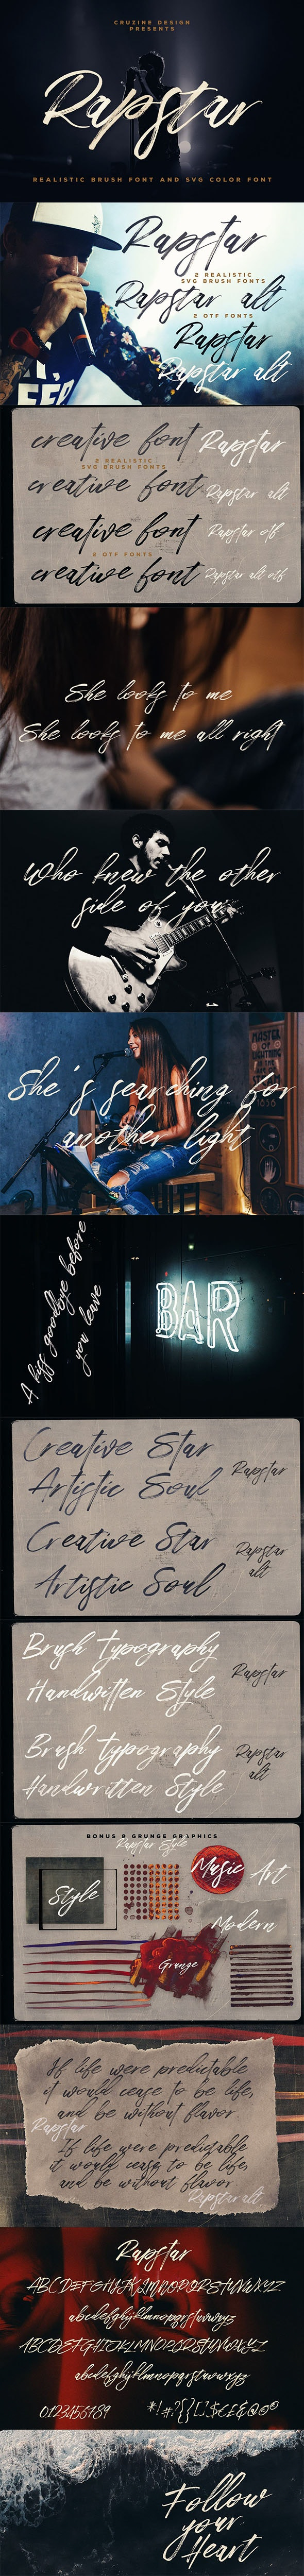 Rapstar Brush & SVG Font - Hand-writing Script